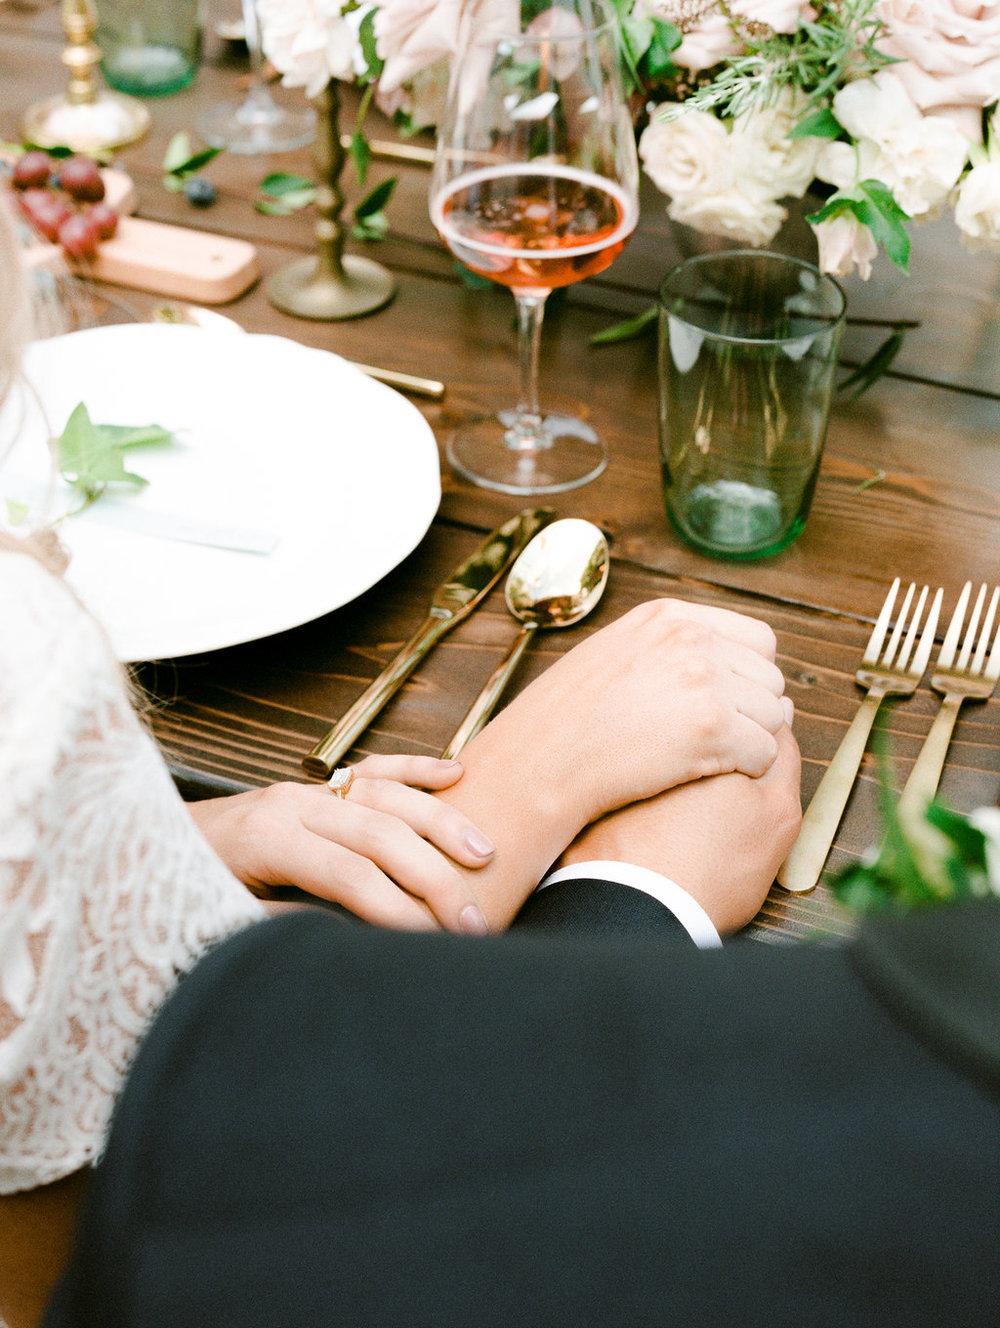 athens-founders-memorial-garden-wedding-photography-hannah-forsberg-atlanta-wedding-photographer-23.jpg